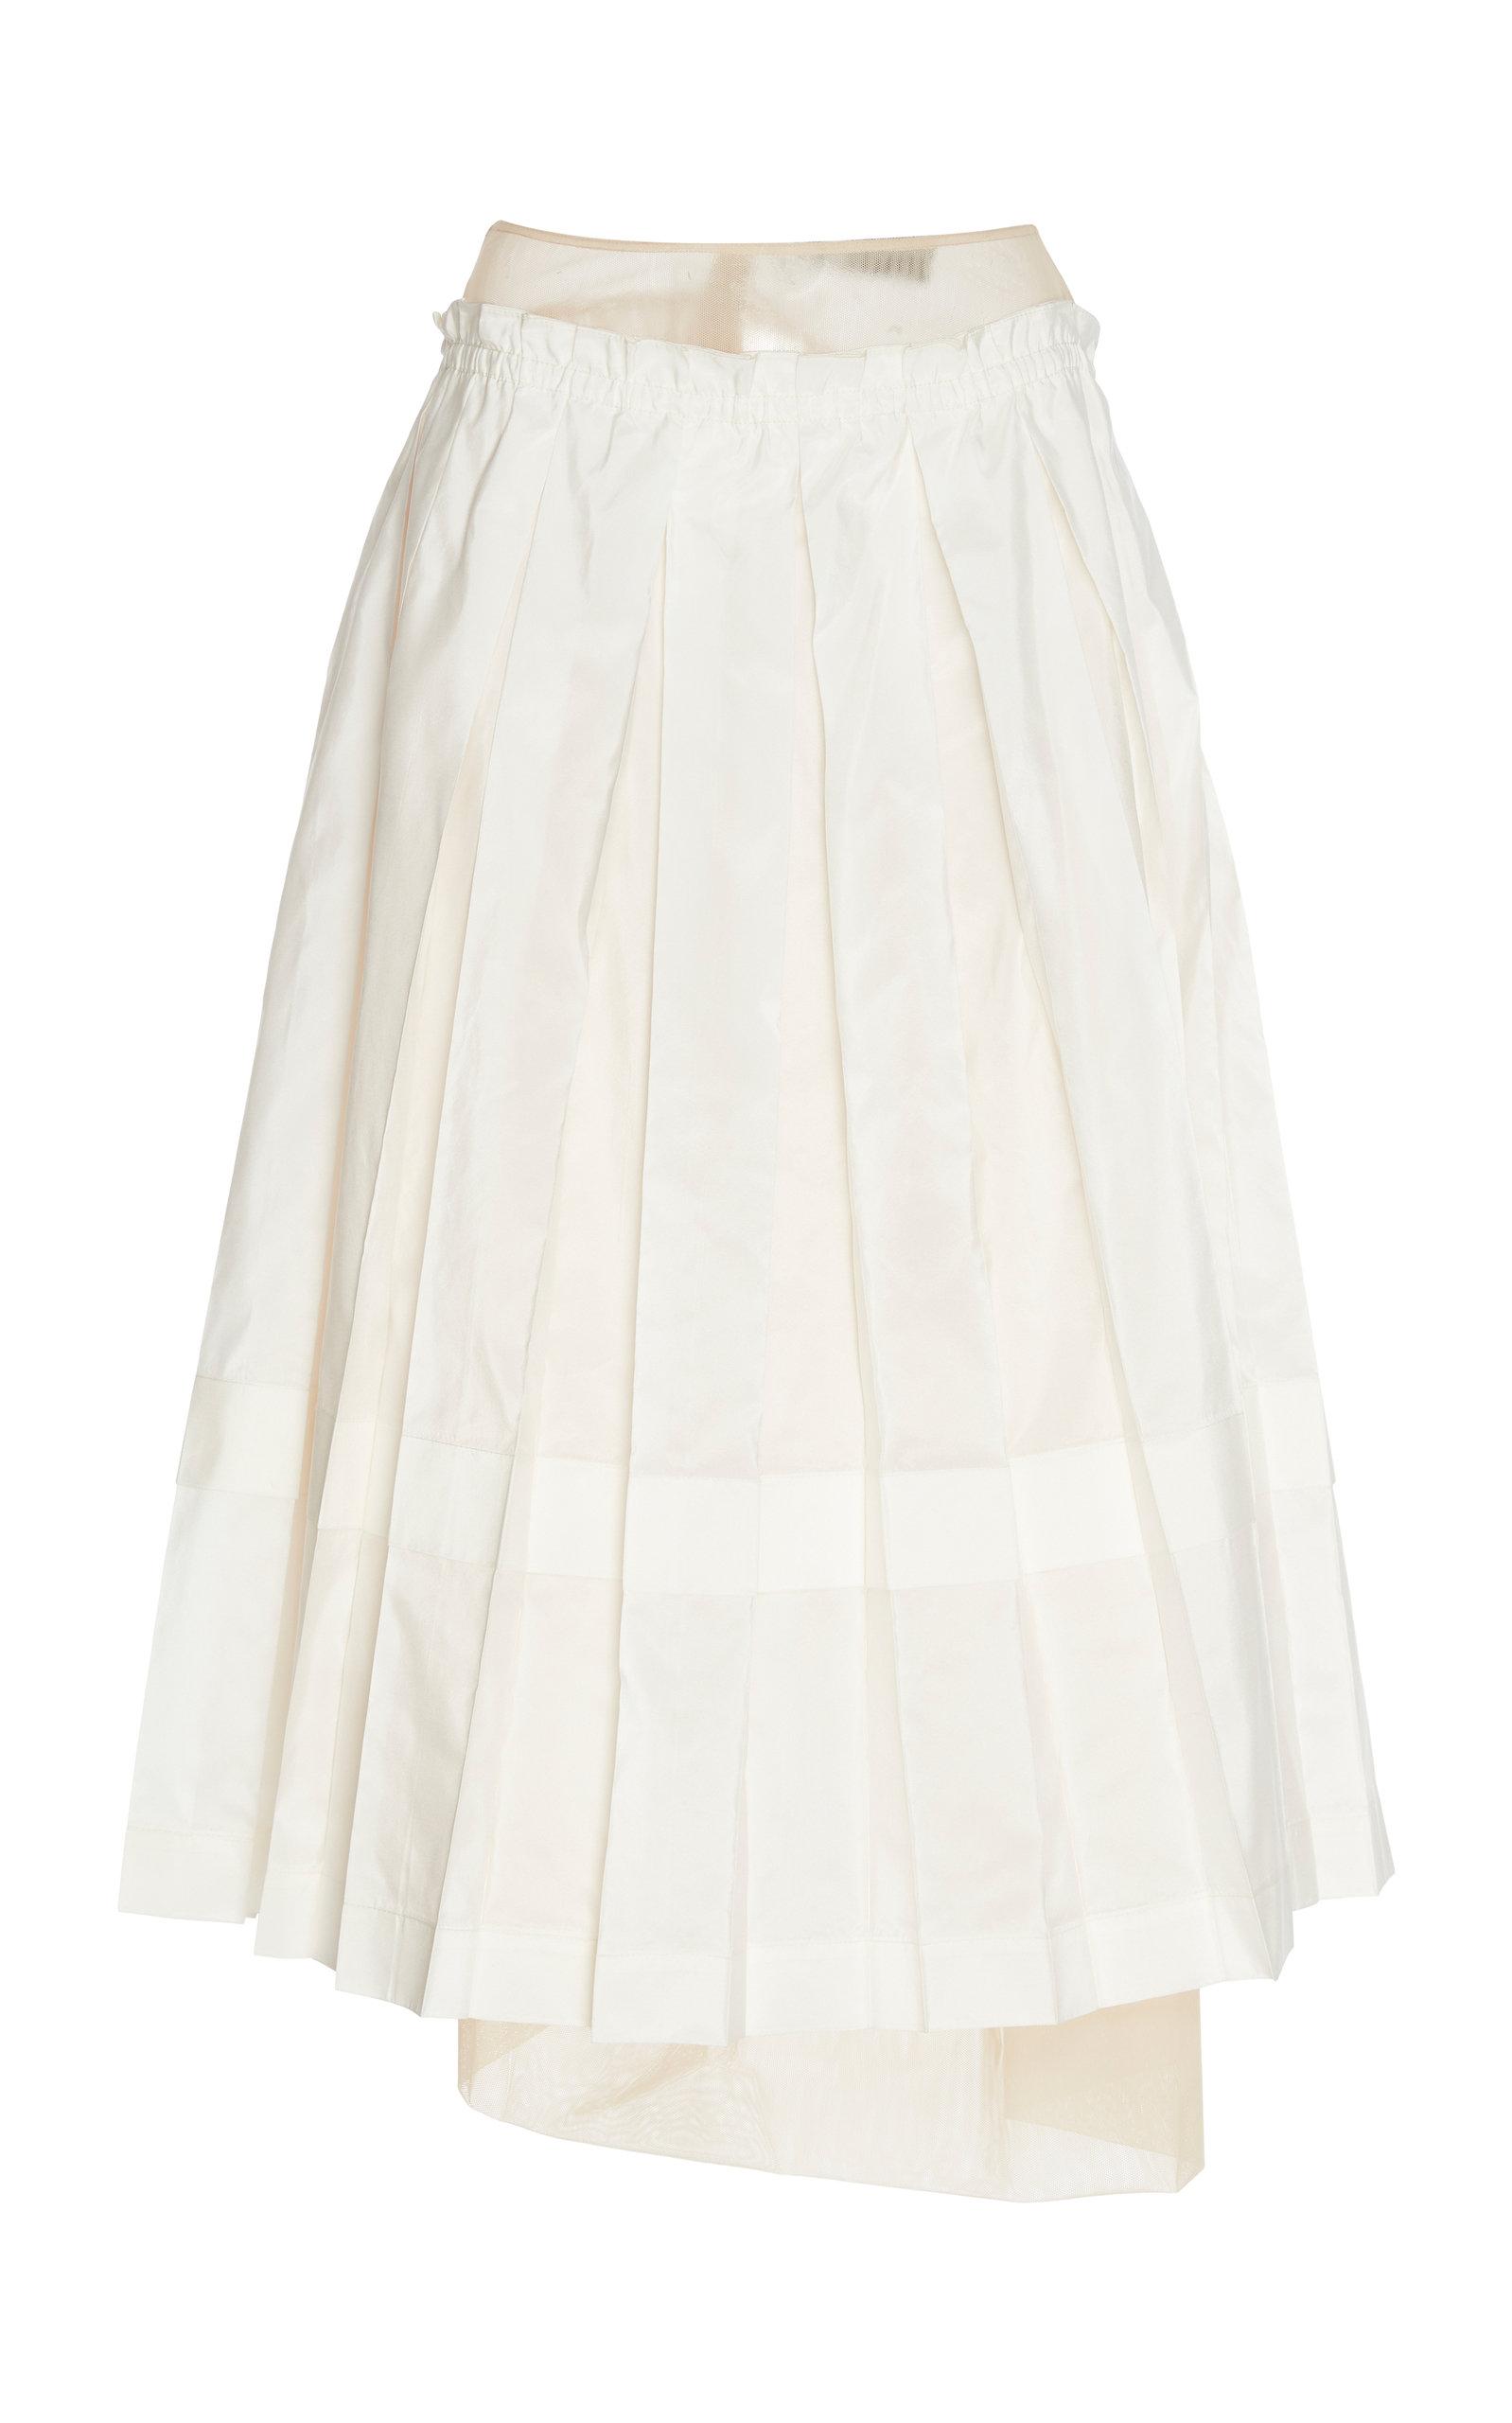 6e3c4ef59 Asymmetric Pleated Twill And Taffeta Skirt by Simone Rocha   Moda ...